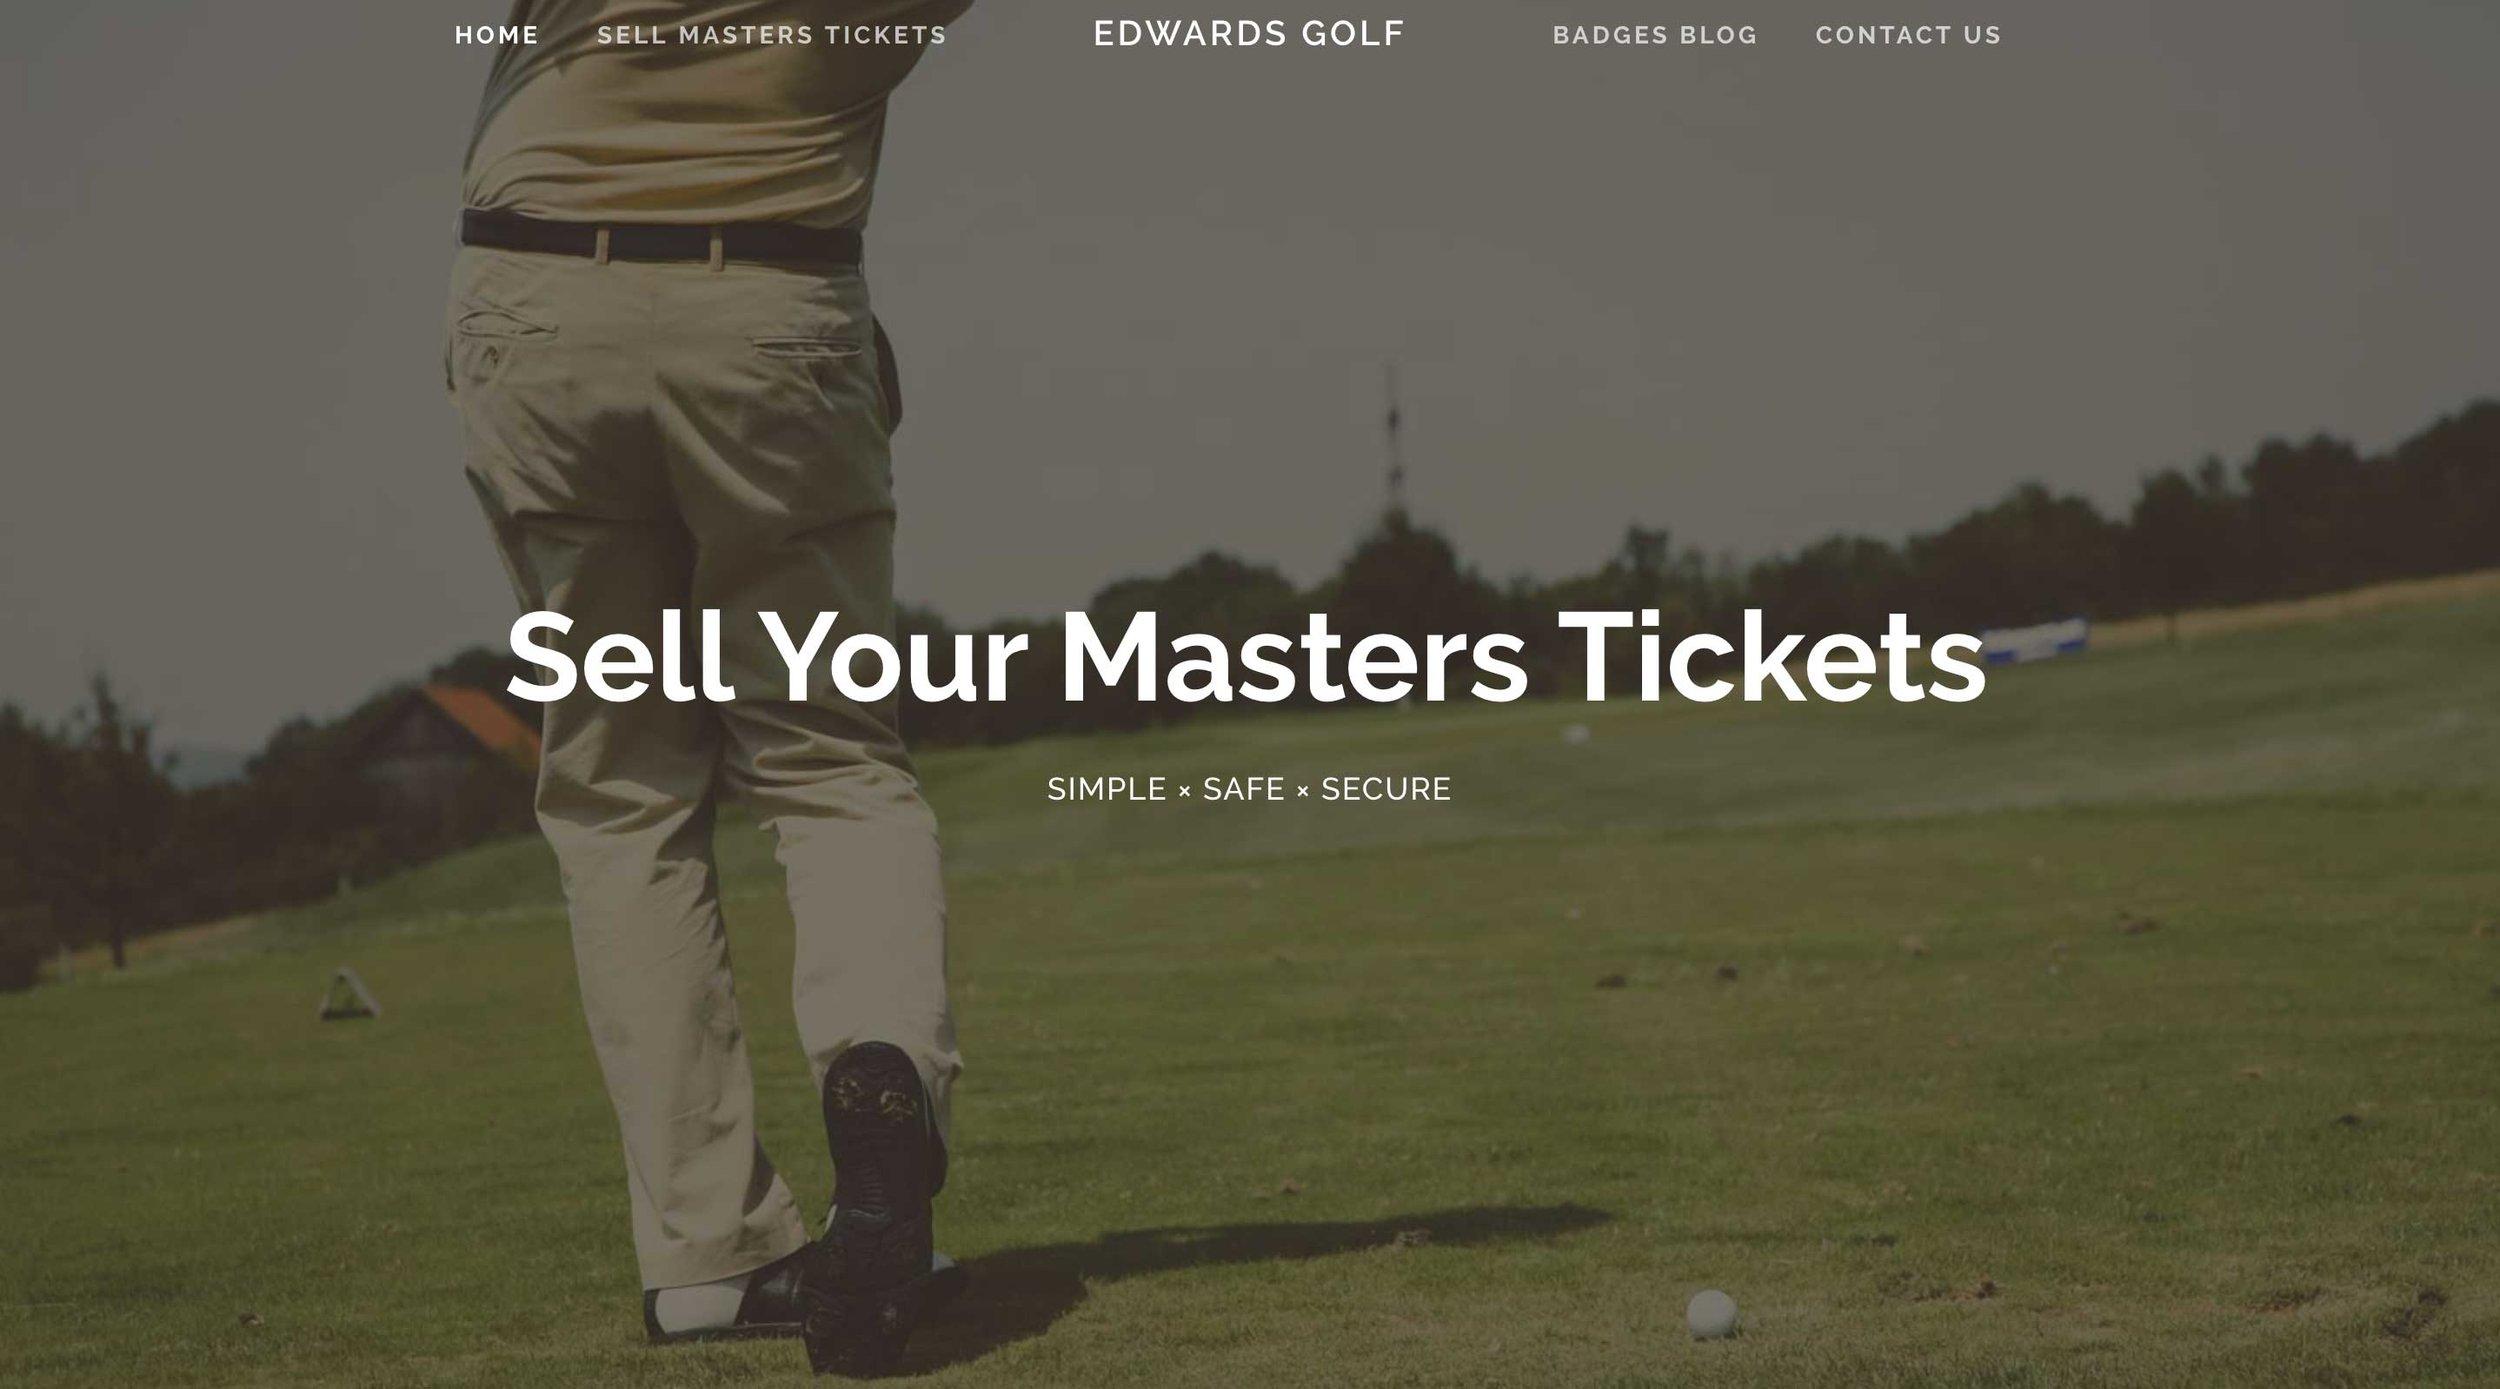 edwards-golf.jpg